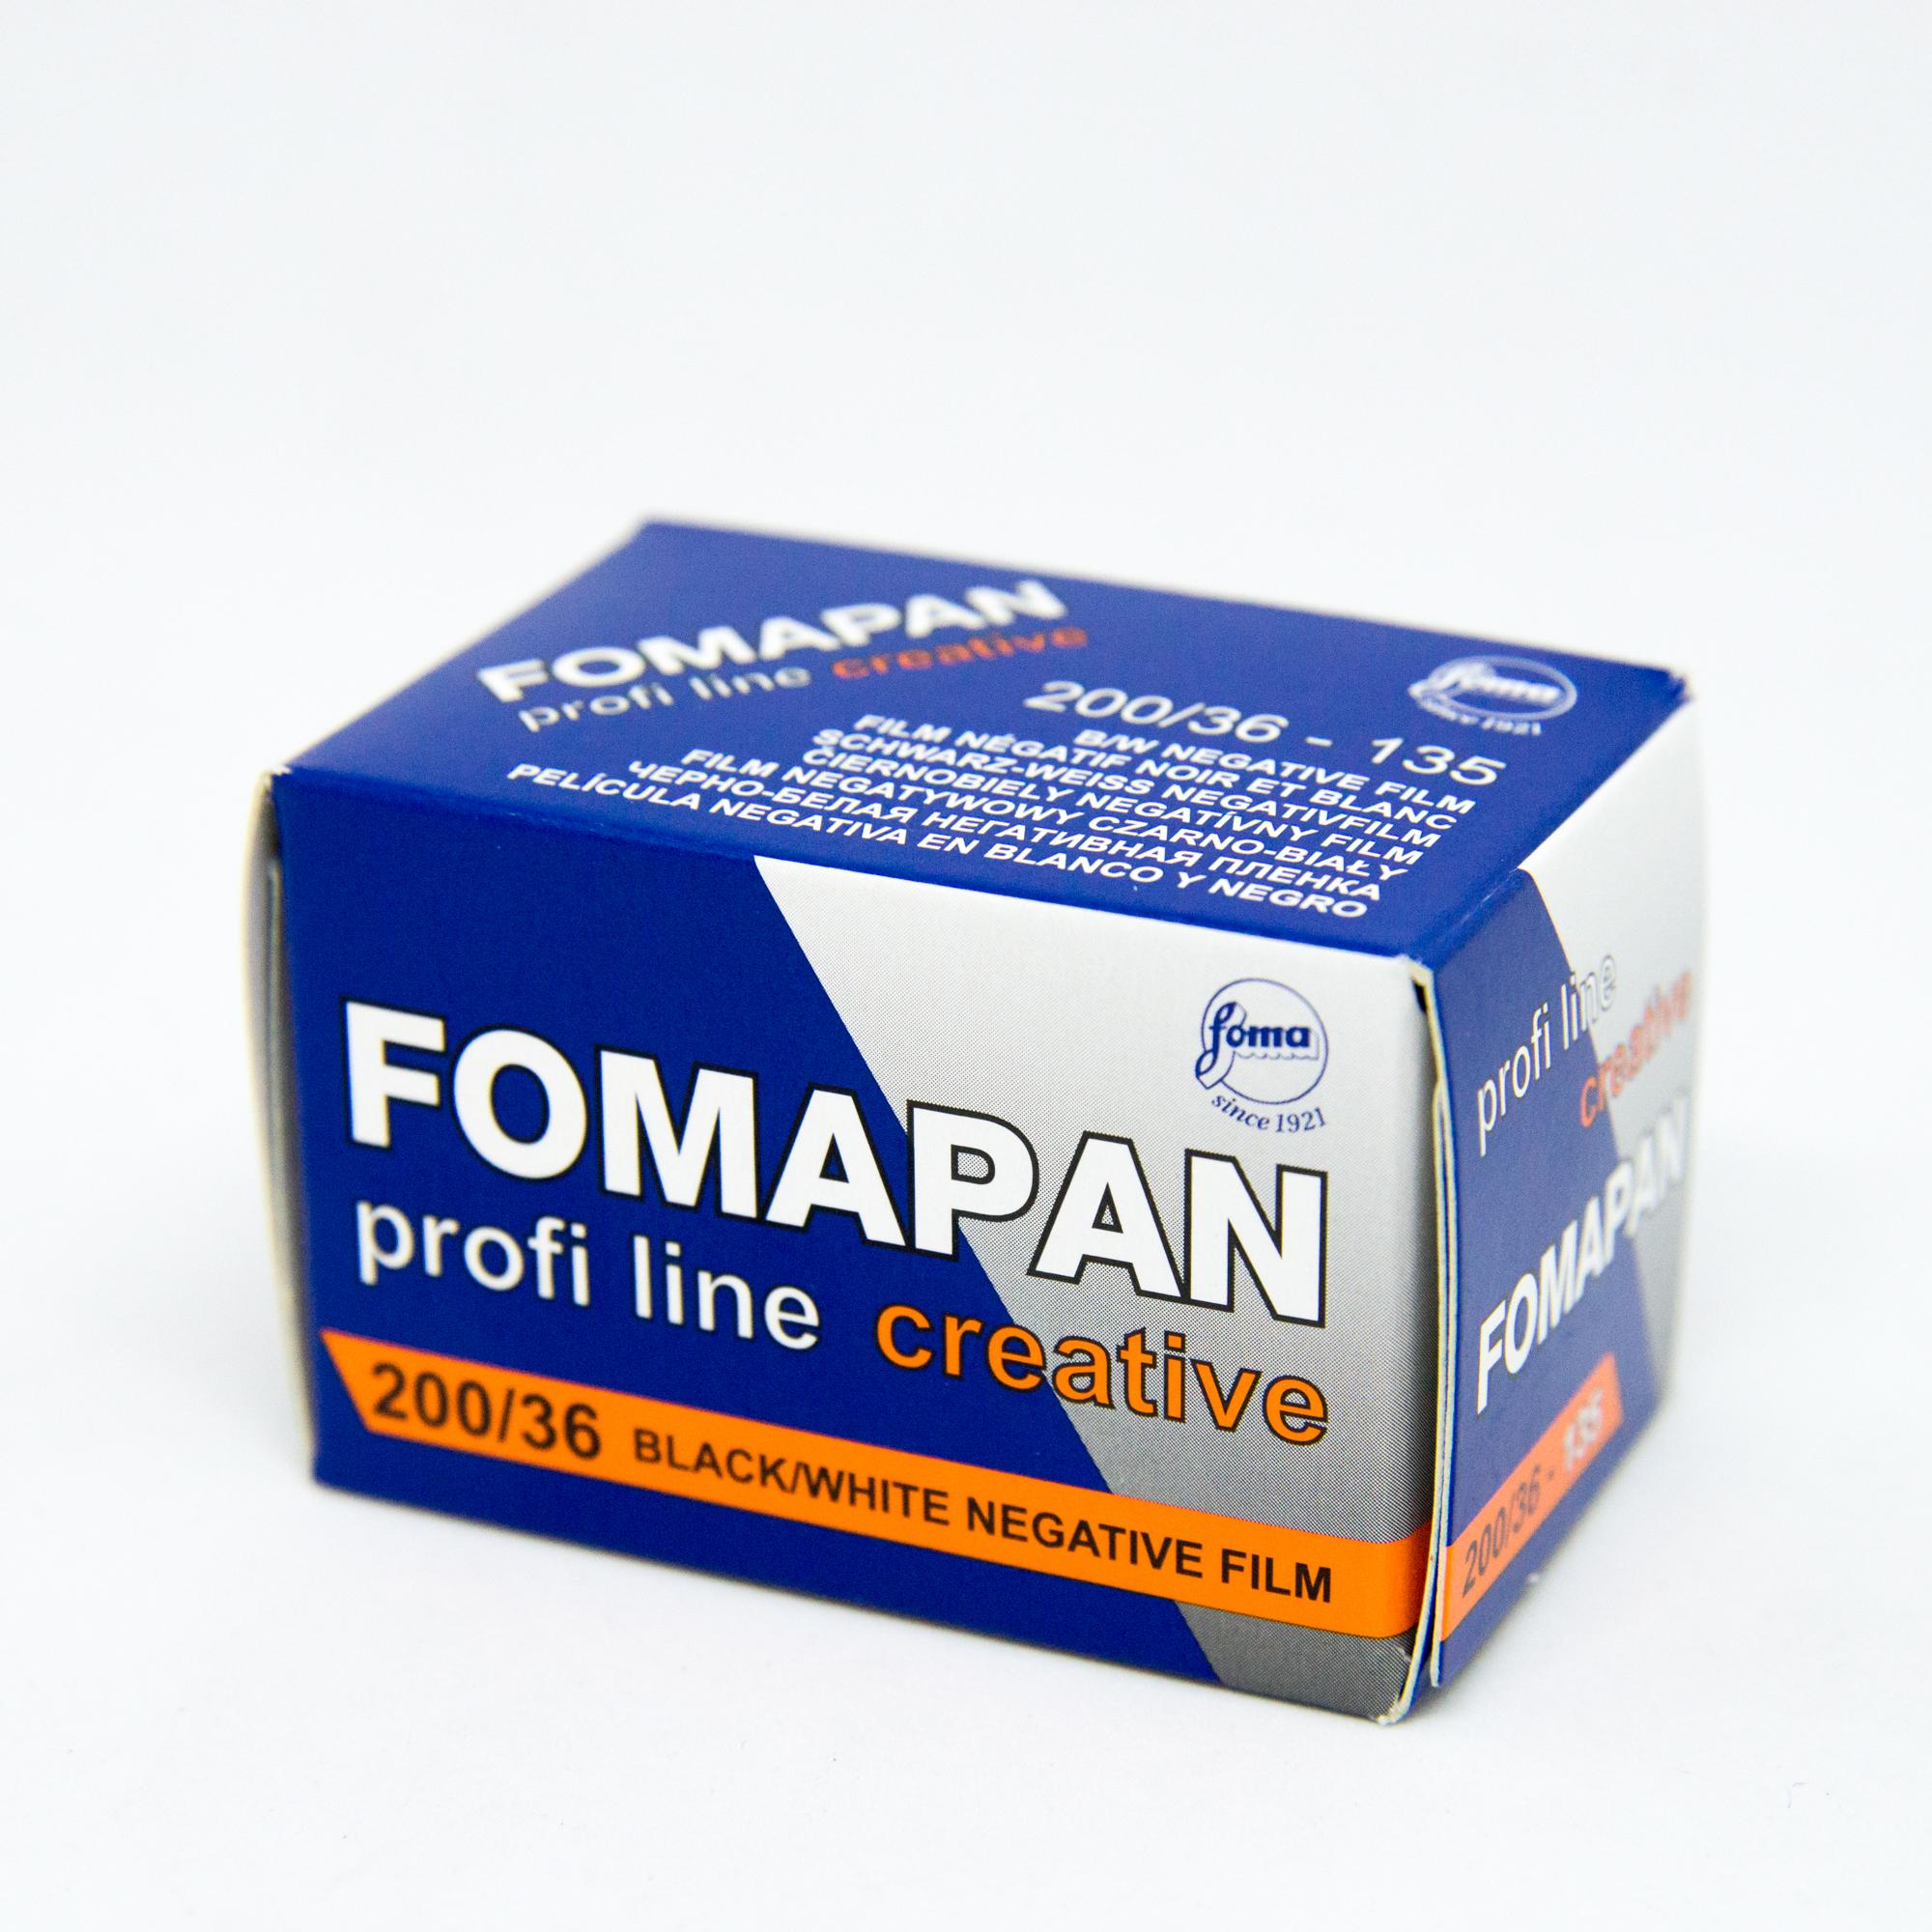 Фотопленка Foma Fomapan 200 Creative /135-36